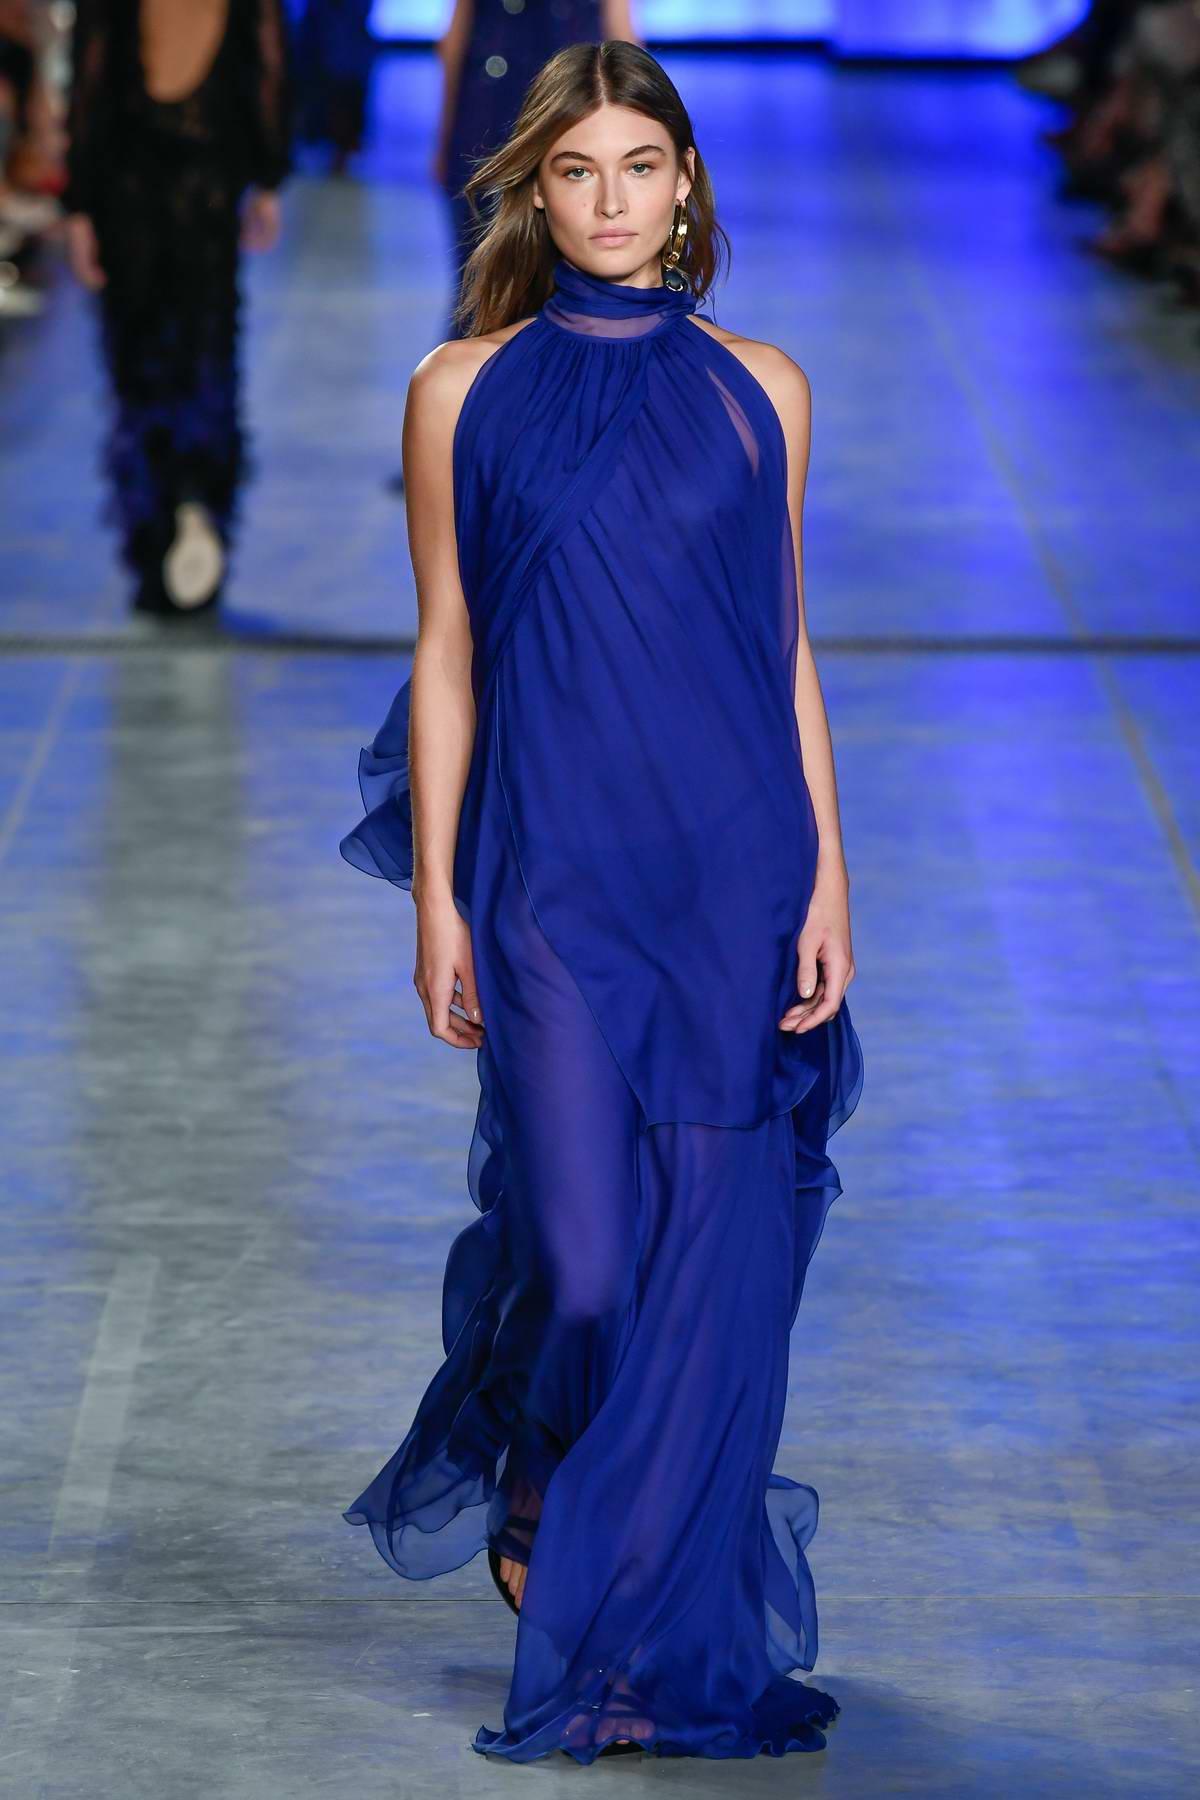 Grace Elizabeth walks the runway for the Alberta Ferretti show S/S 2020 during Milan Fashion Week in Milan, Italy